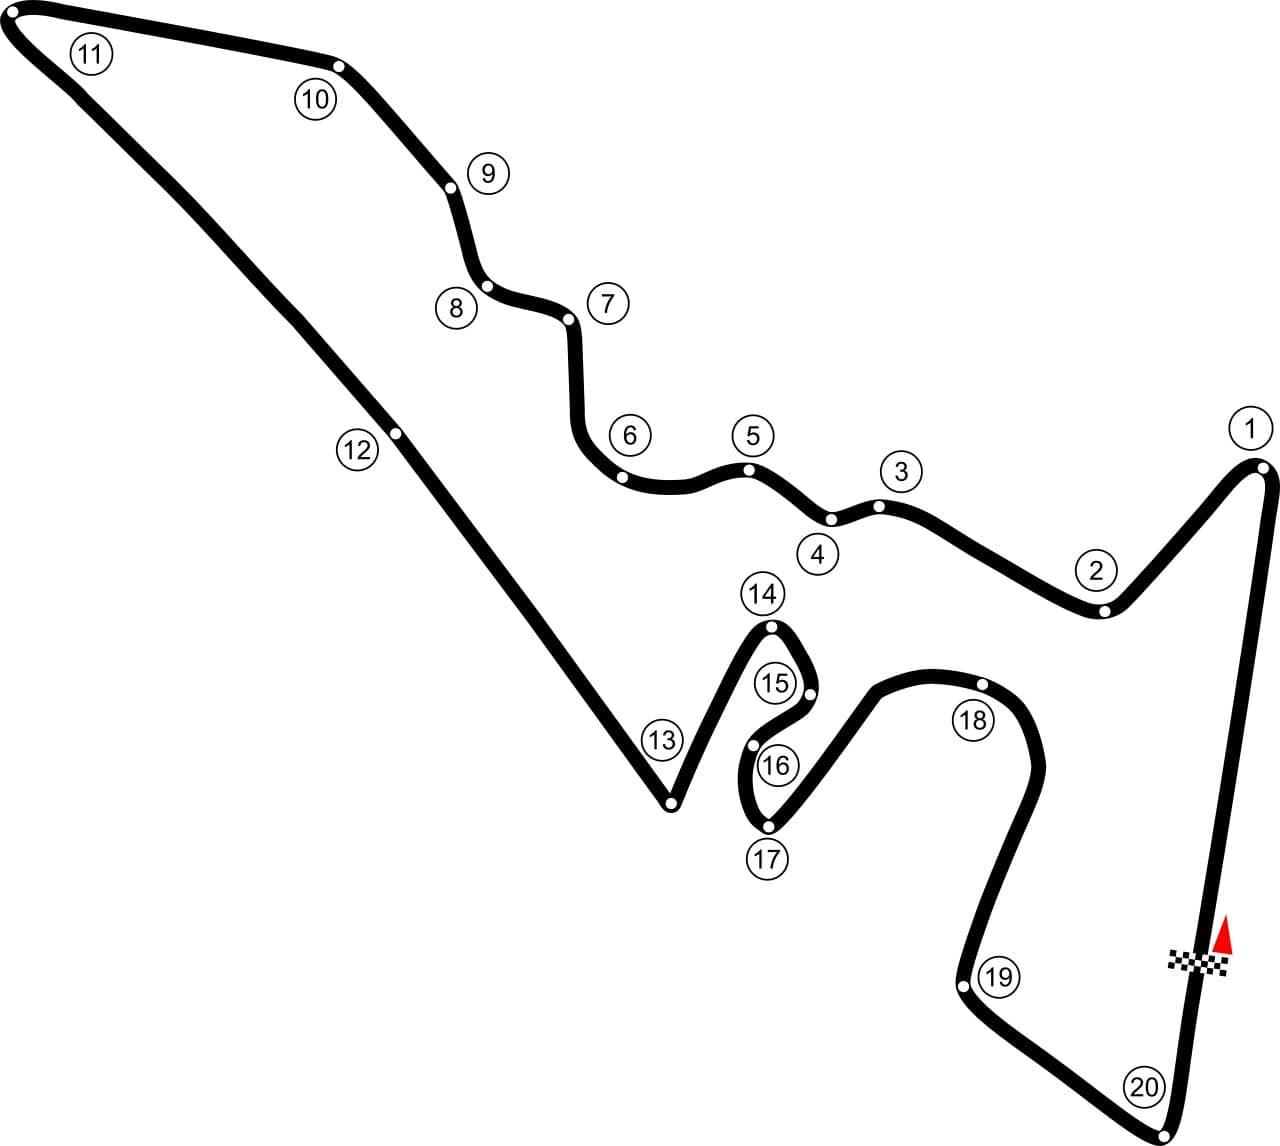 Grand Prix des États-Unis 2021